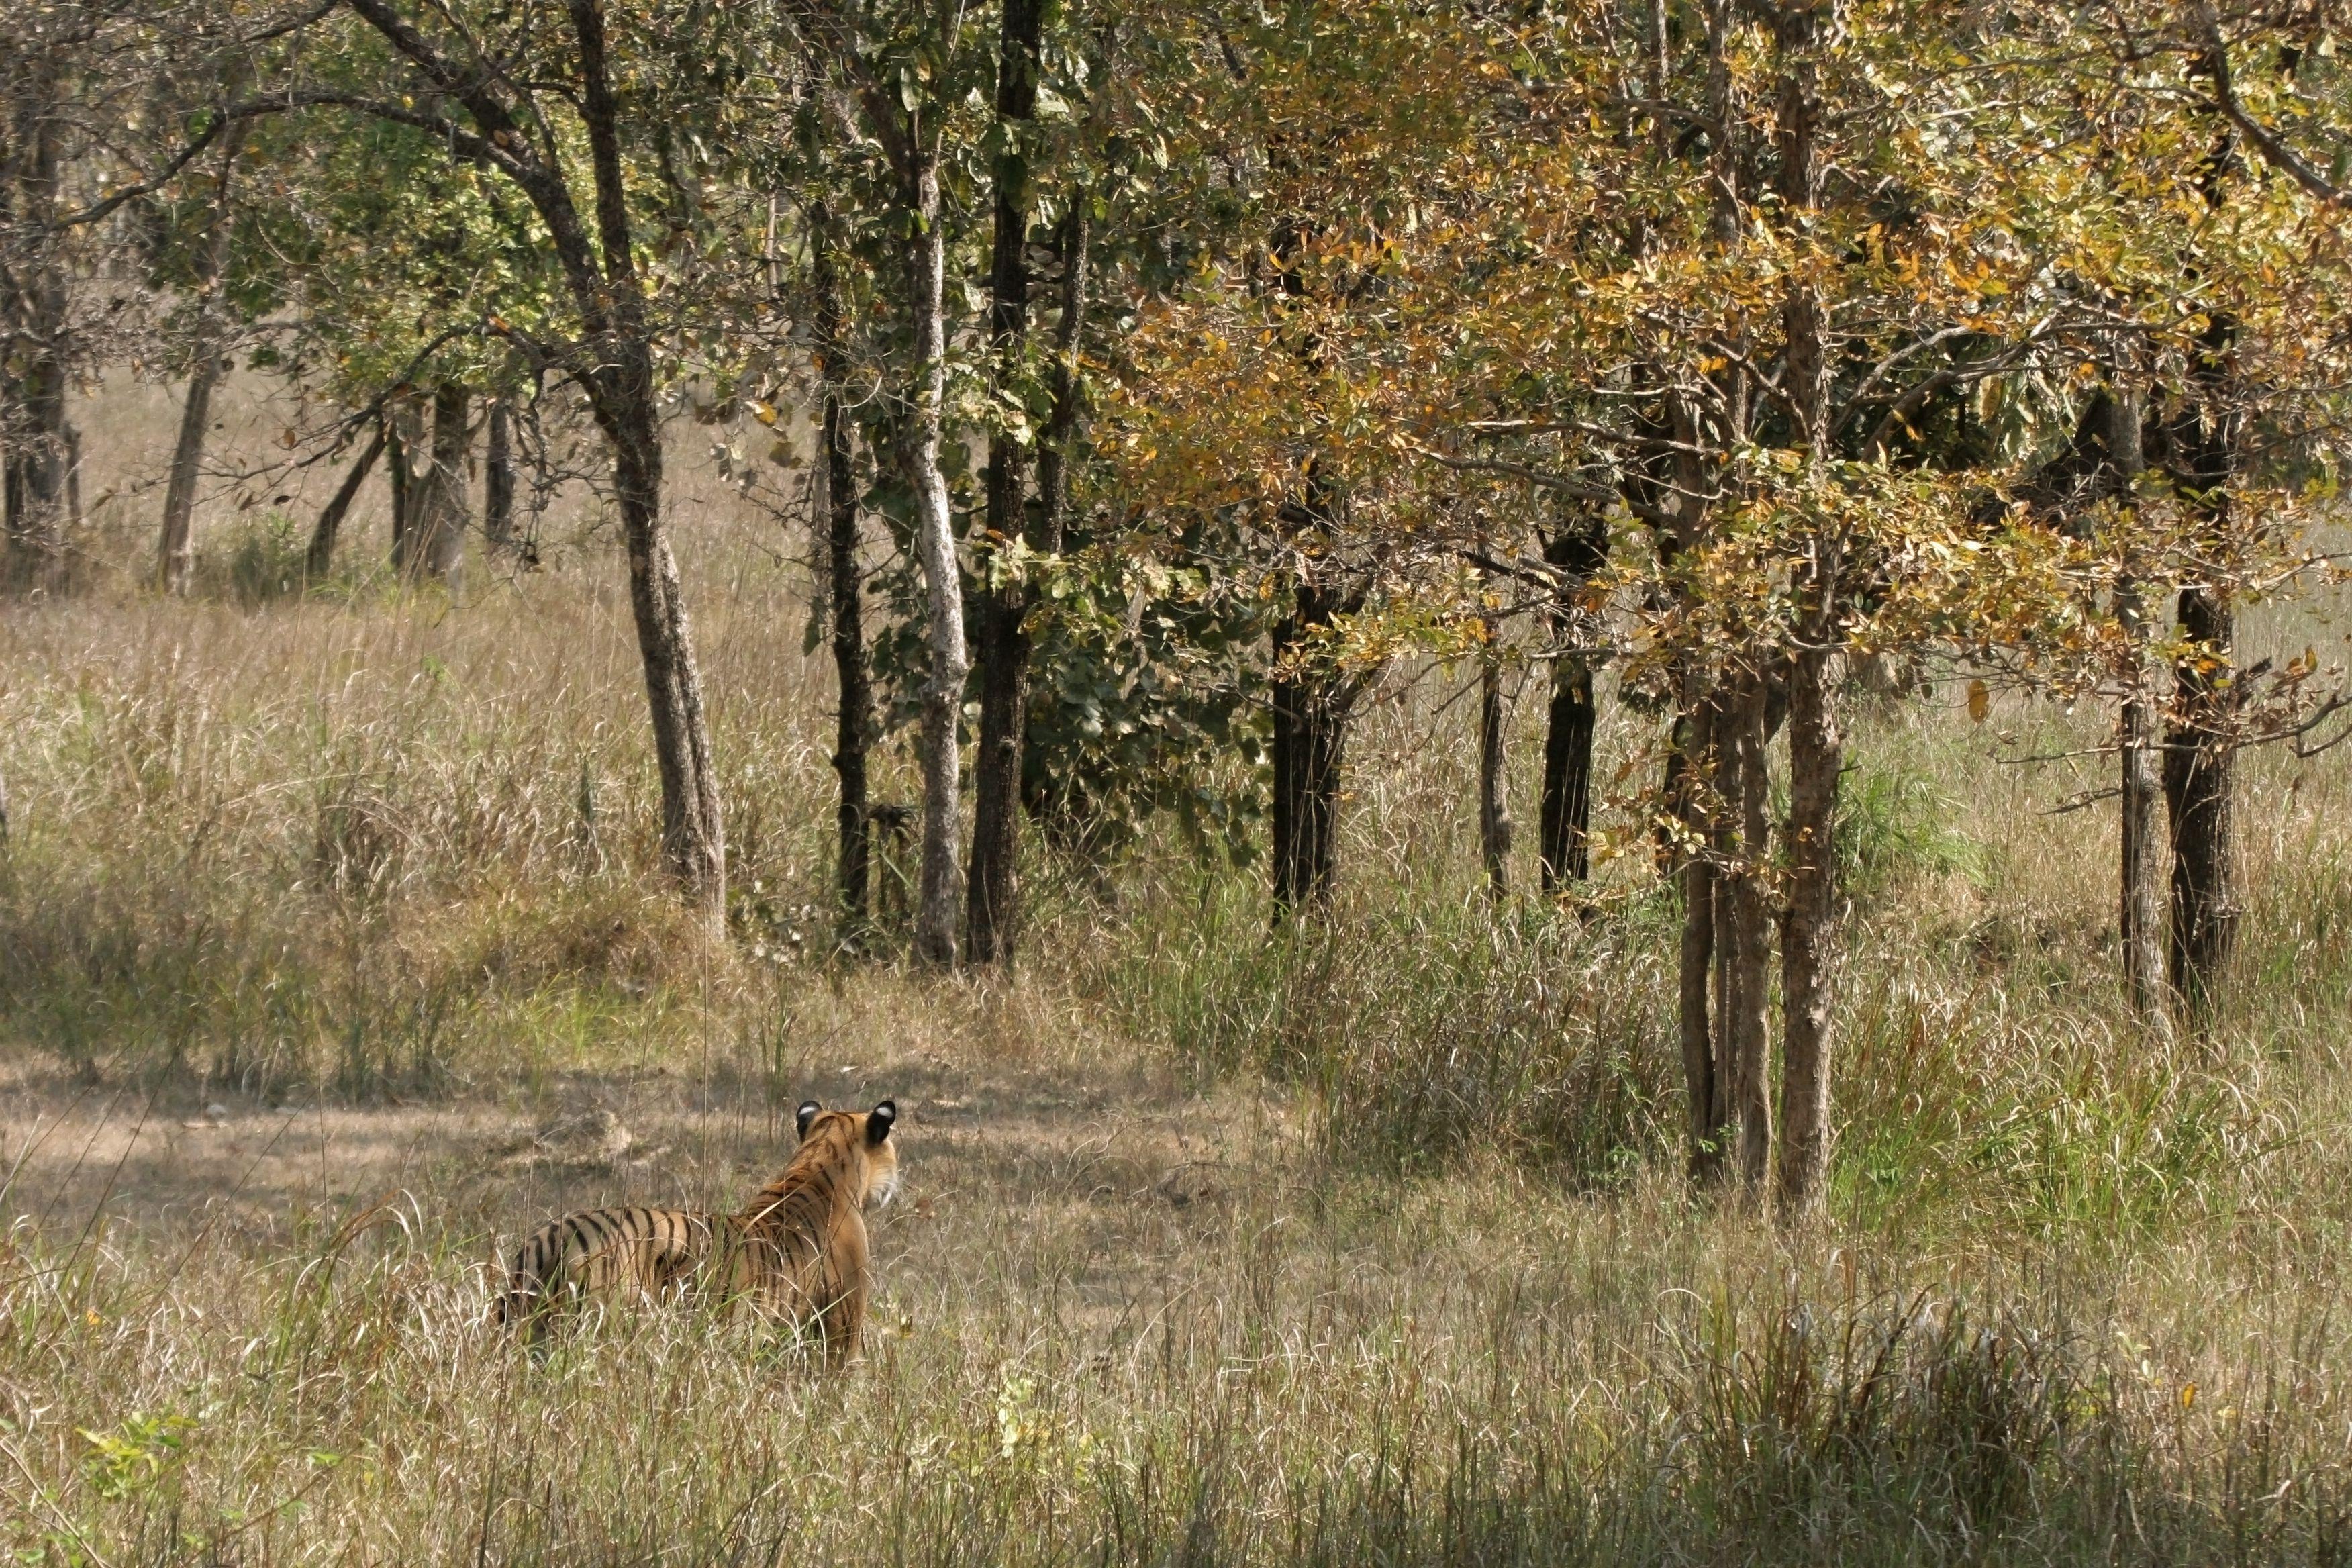 Tiger in Kanha National Park.